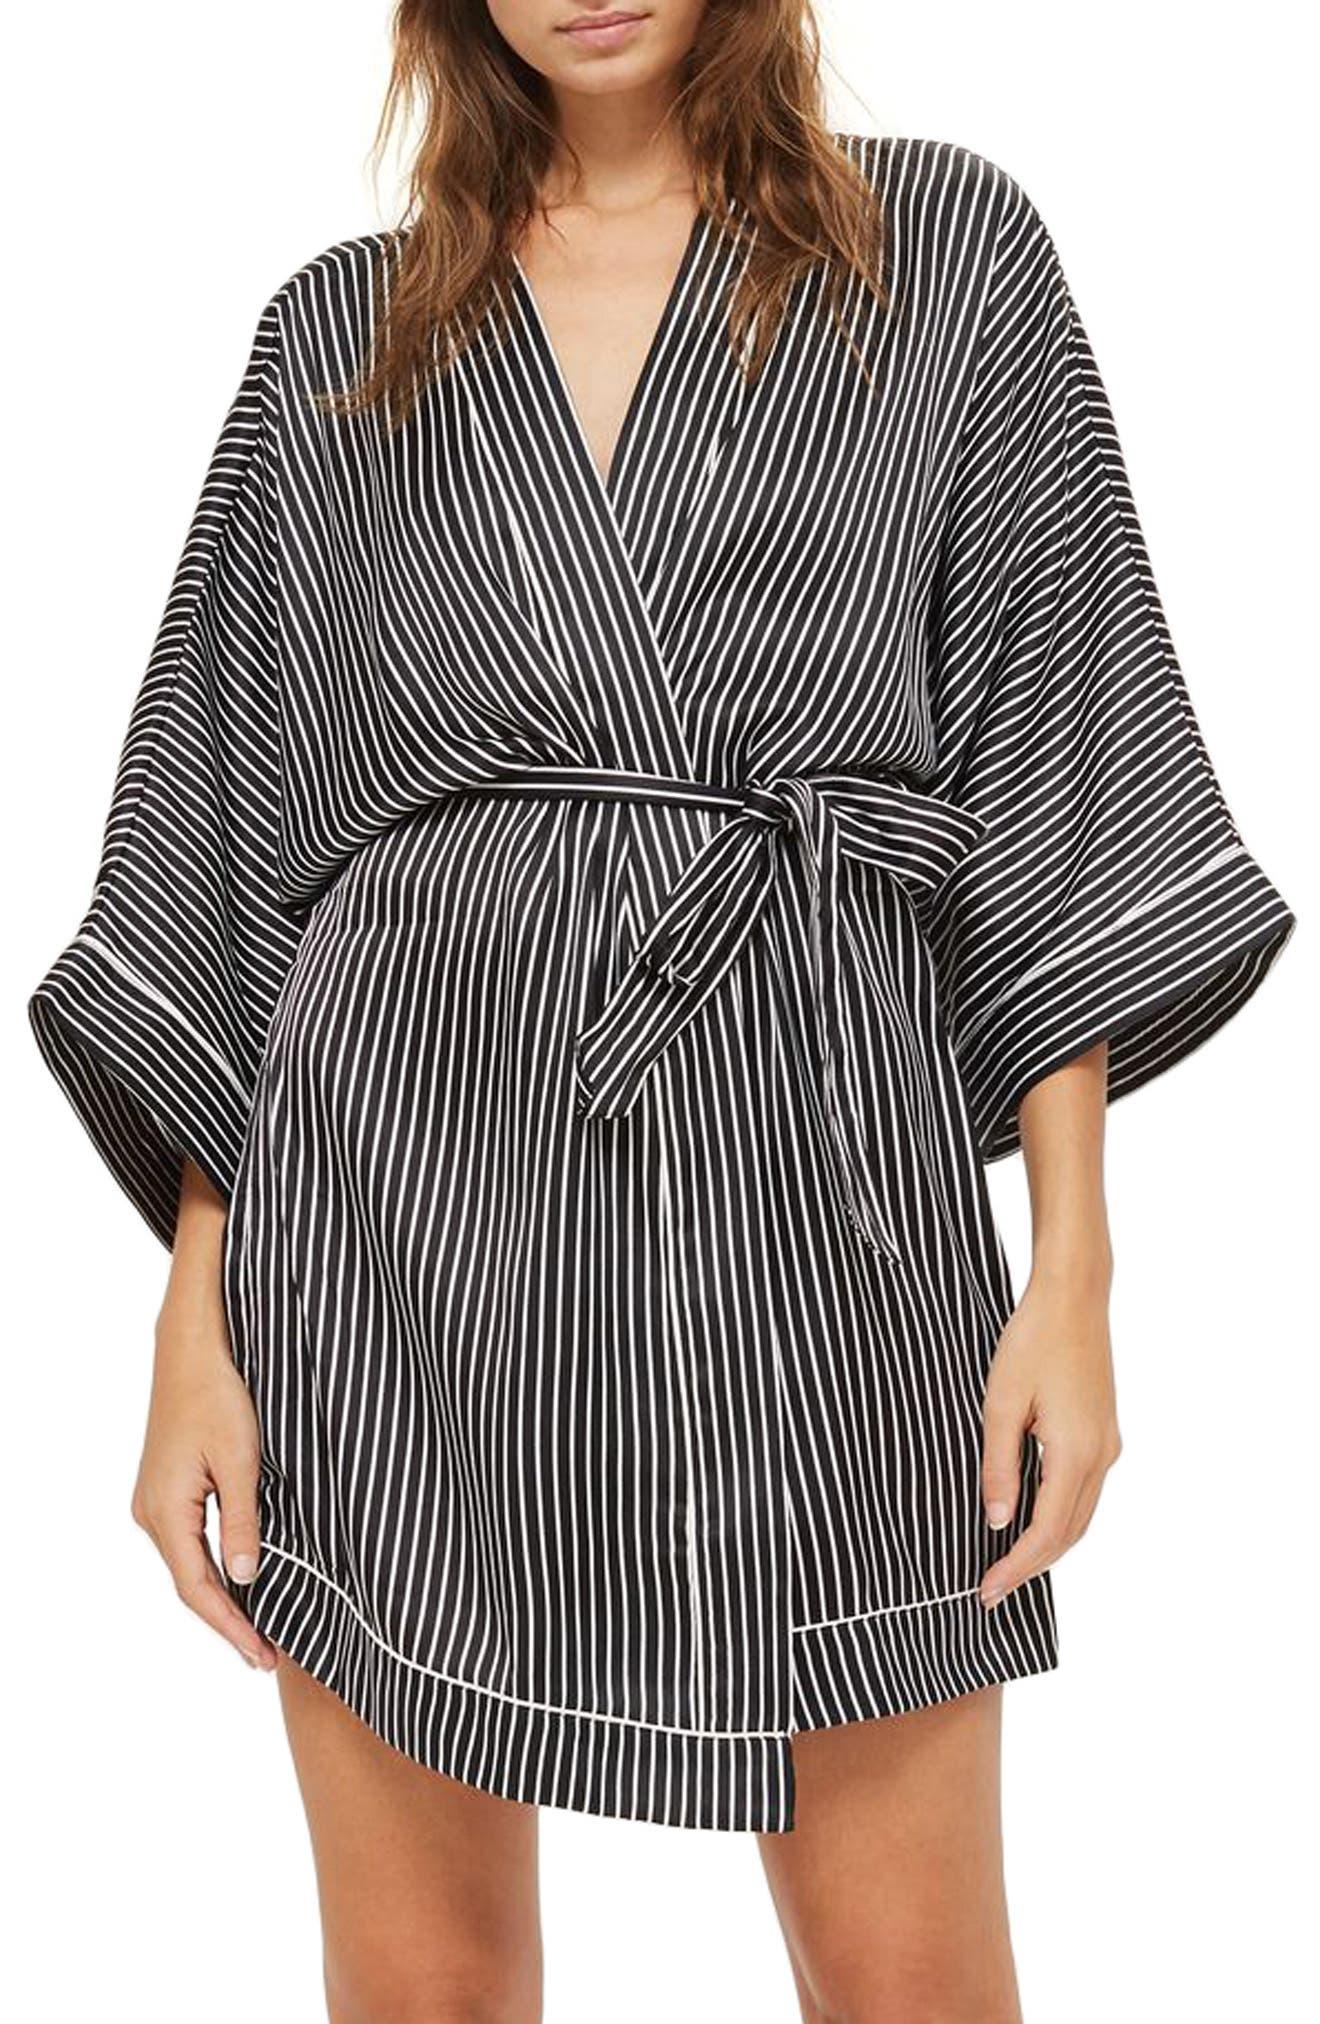 Alternate Image 1 Selected - Topshop Stripe Satin Robe